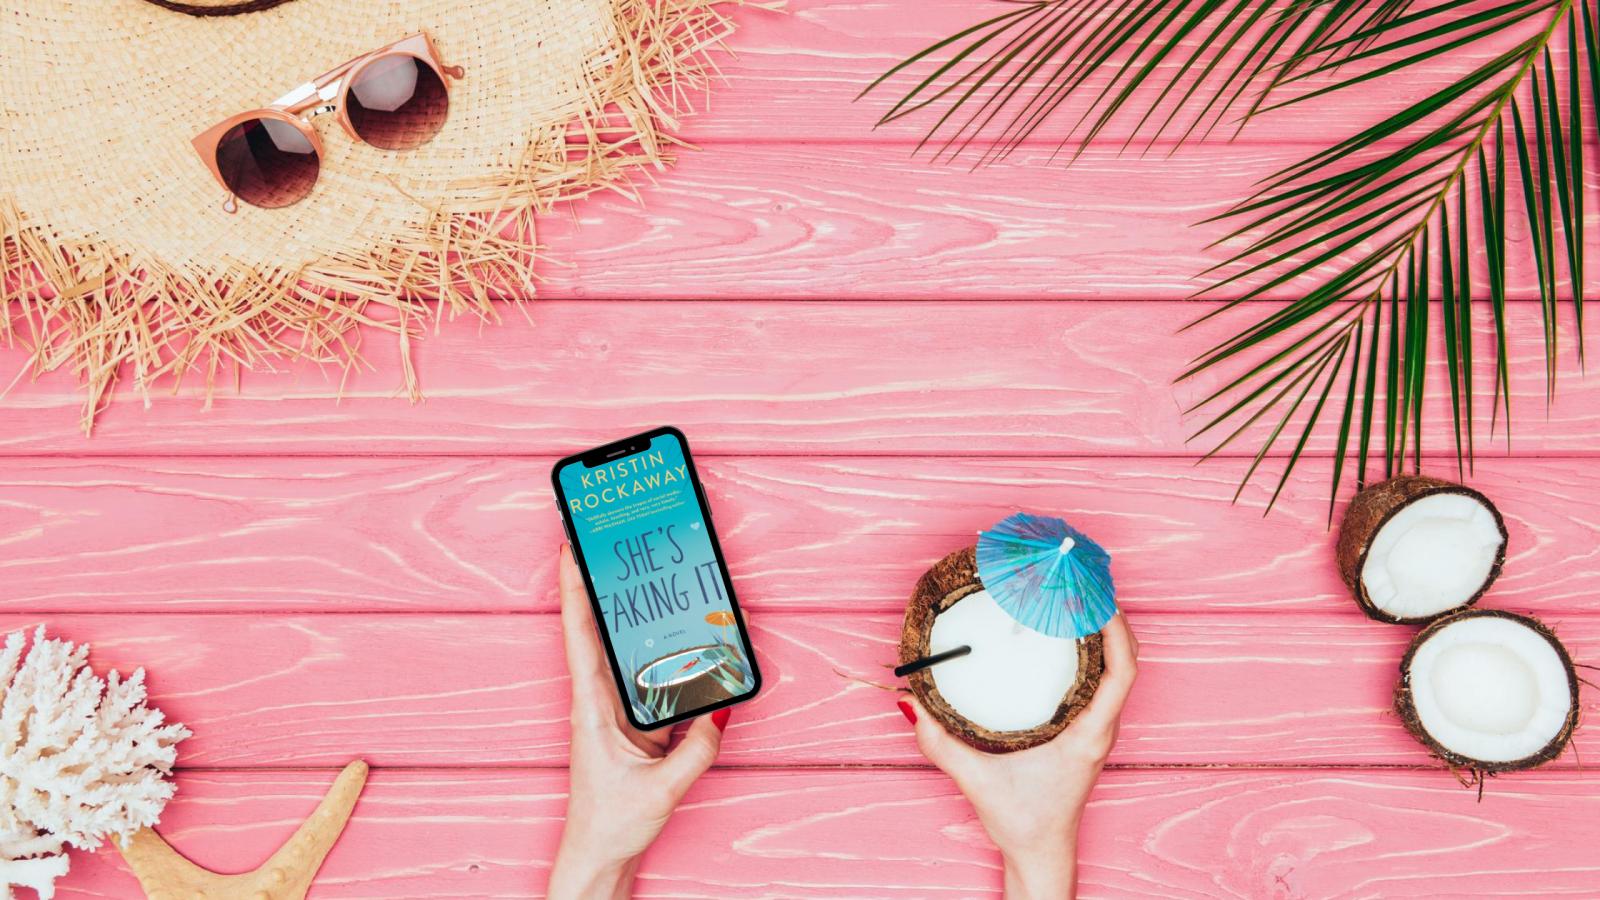 She's Faking It by Kristin Rockaway ebook in tropical setting